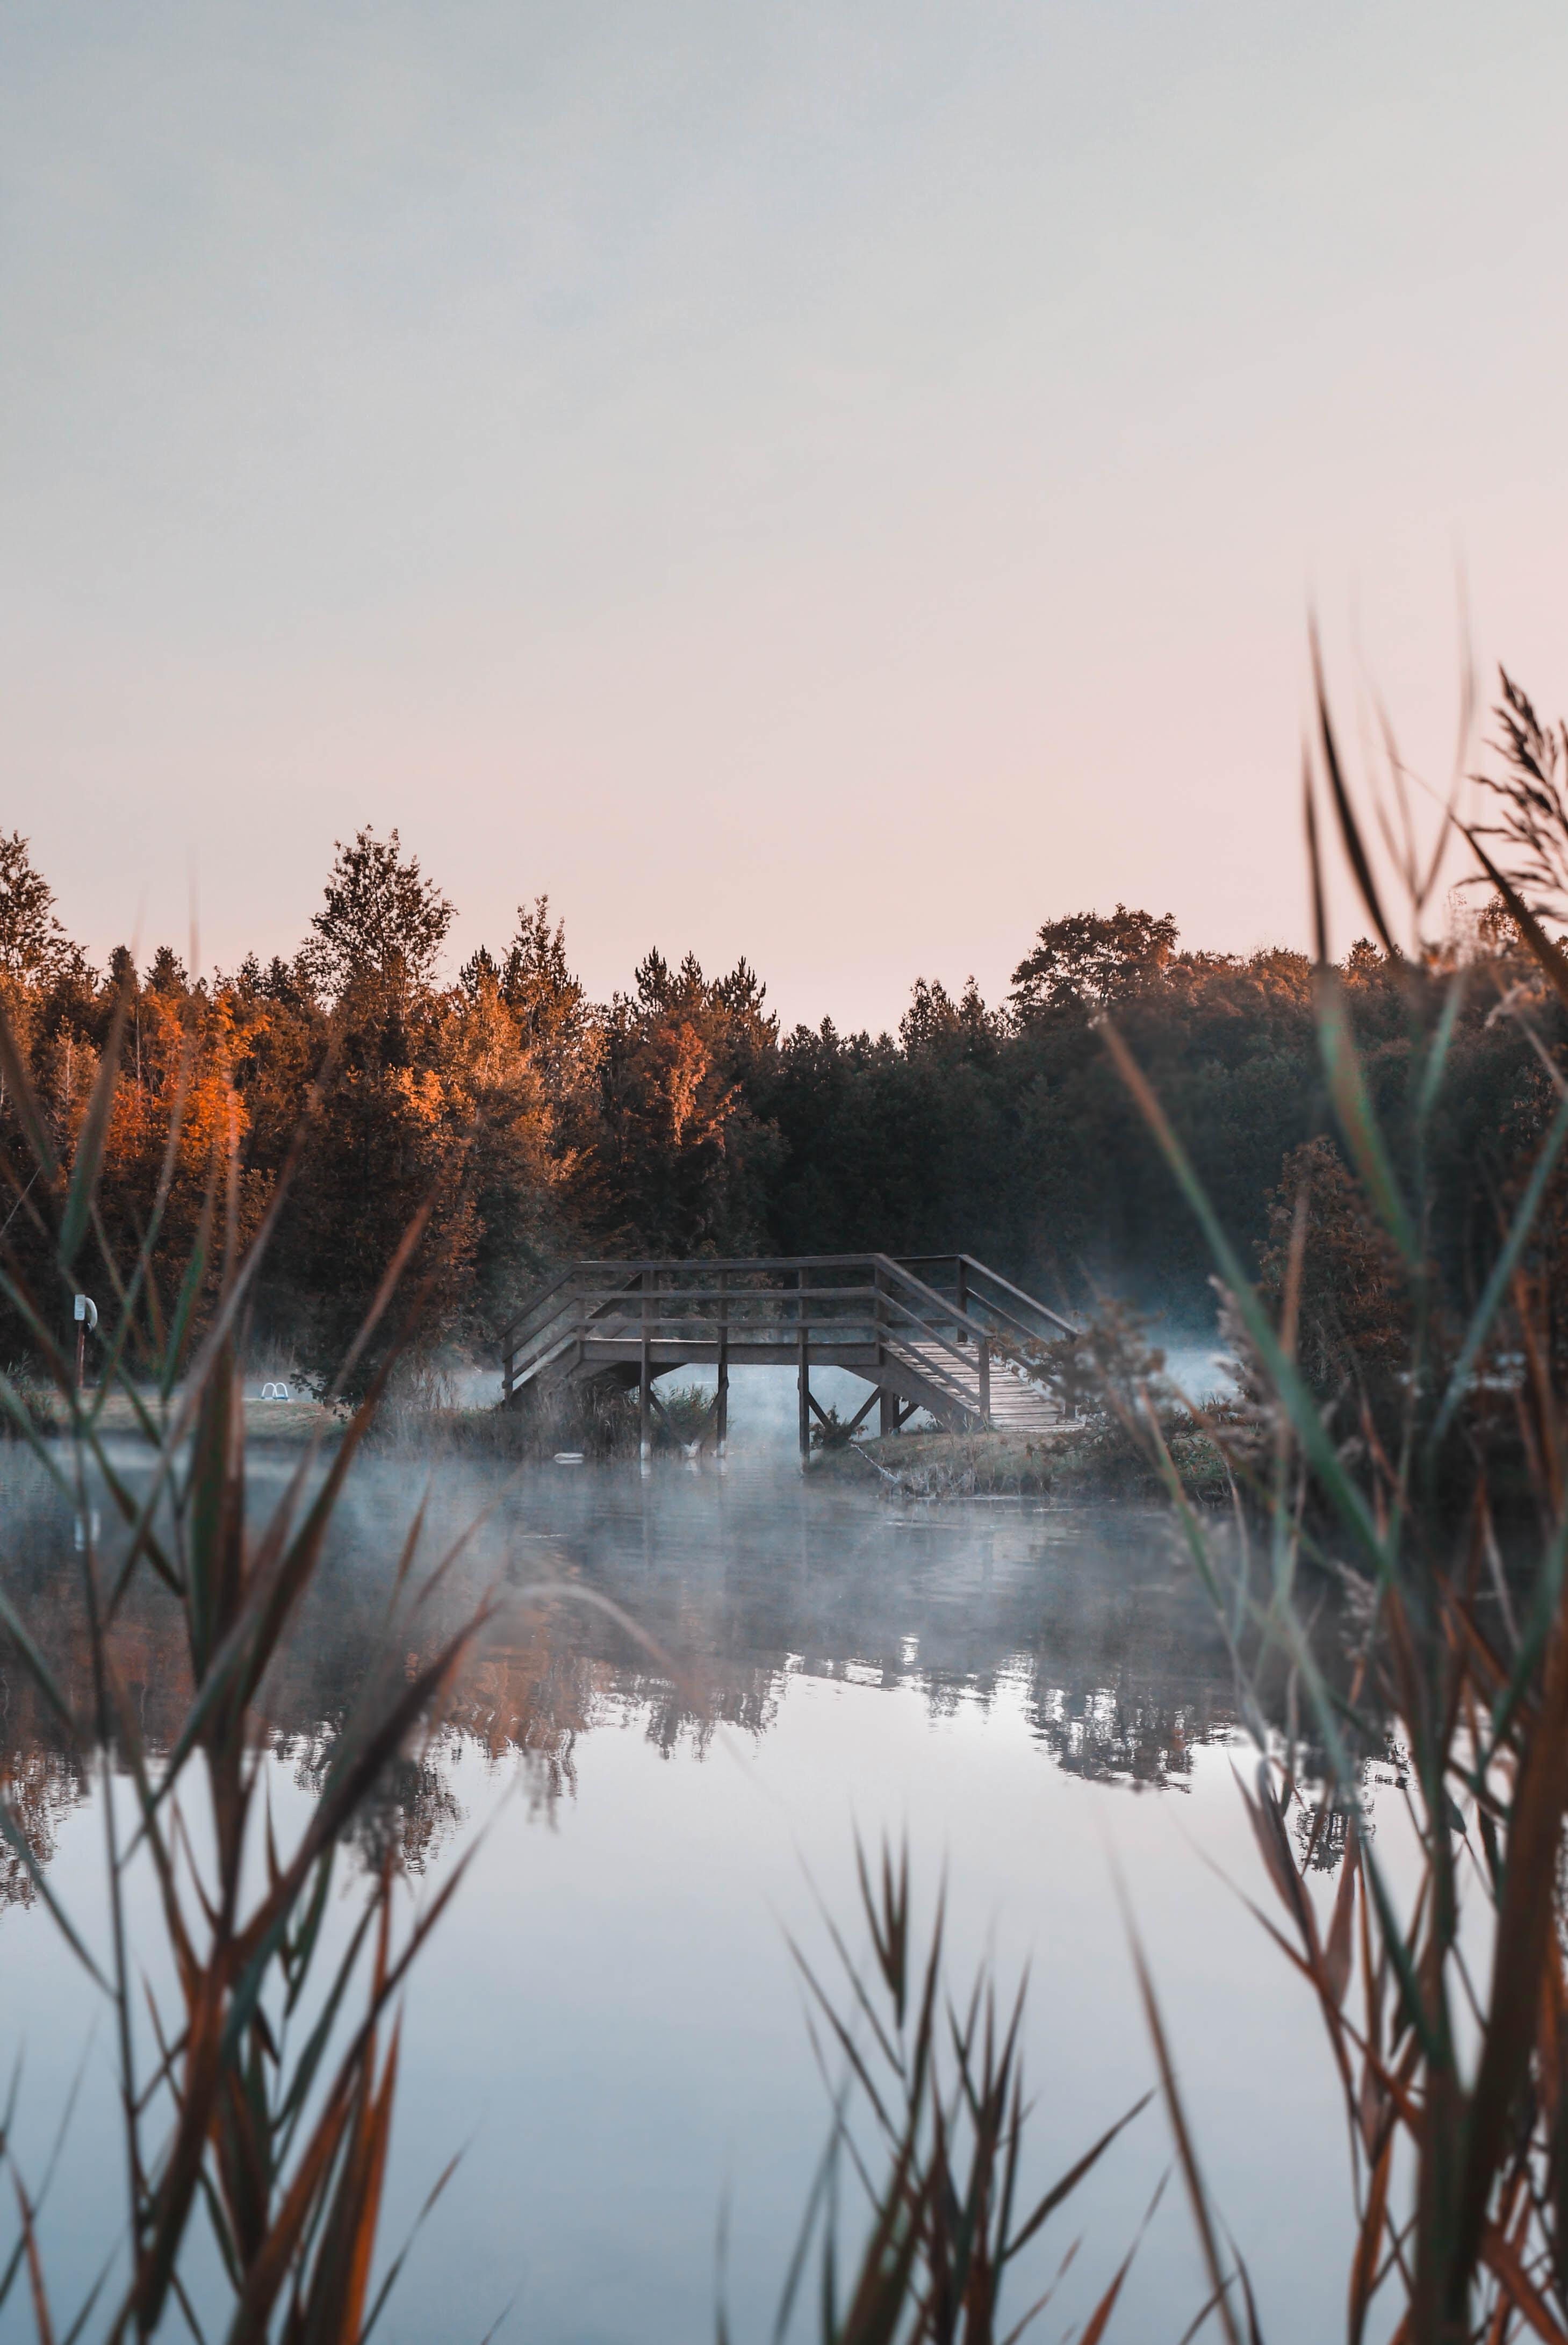 gray concrete bridge beside body of water during daytime